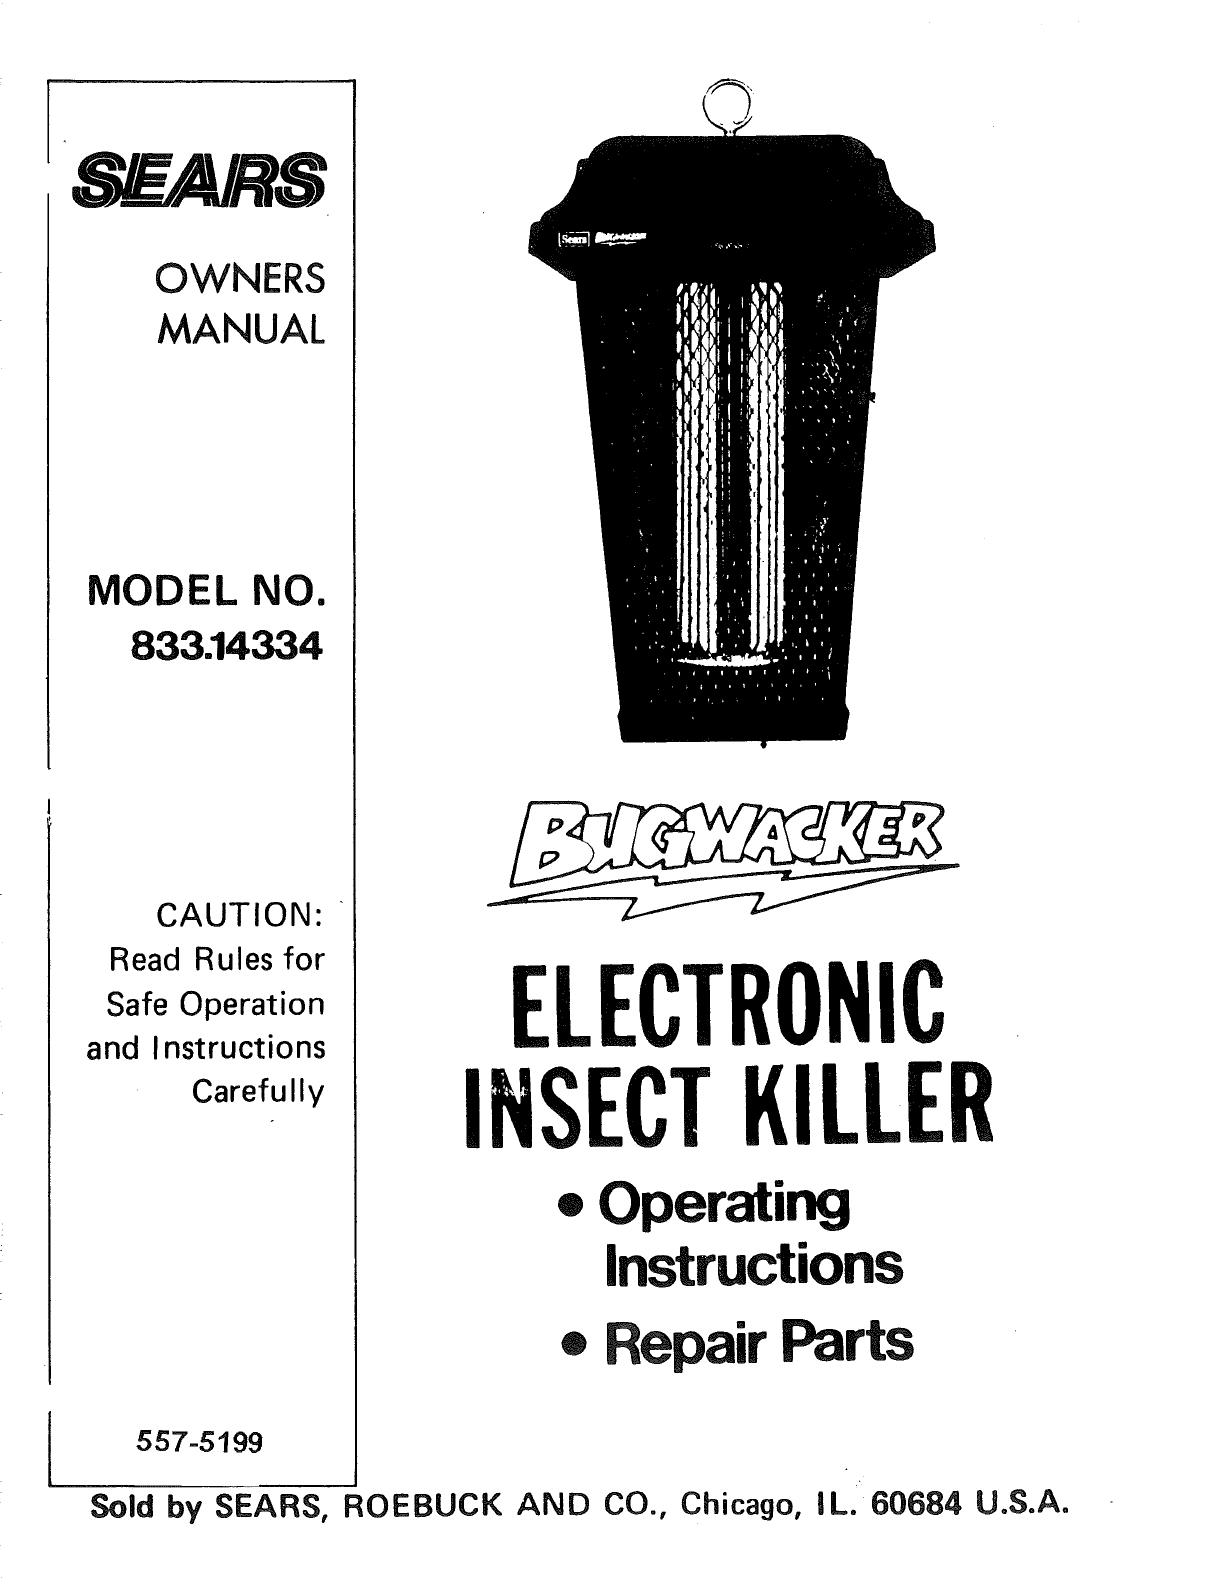 Craftsman Bugwacker 833 14334 Operating Instructions